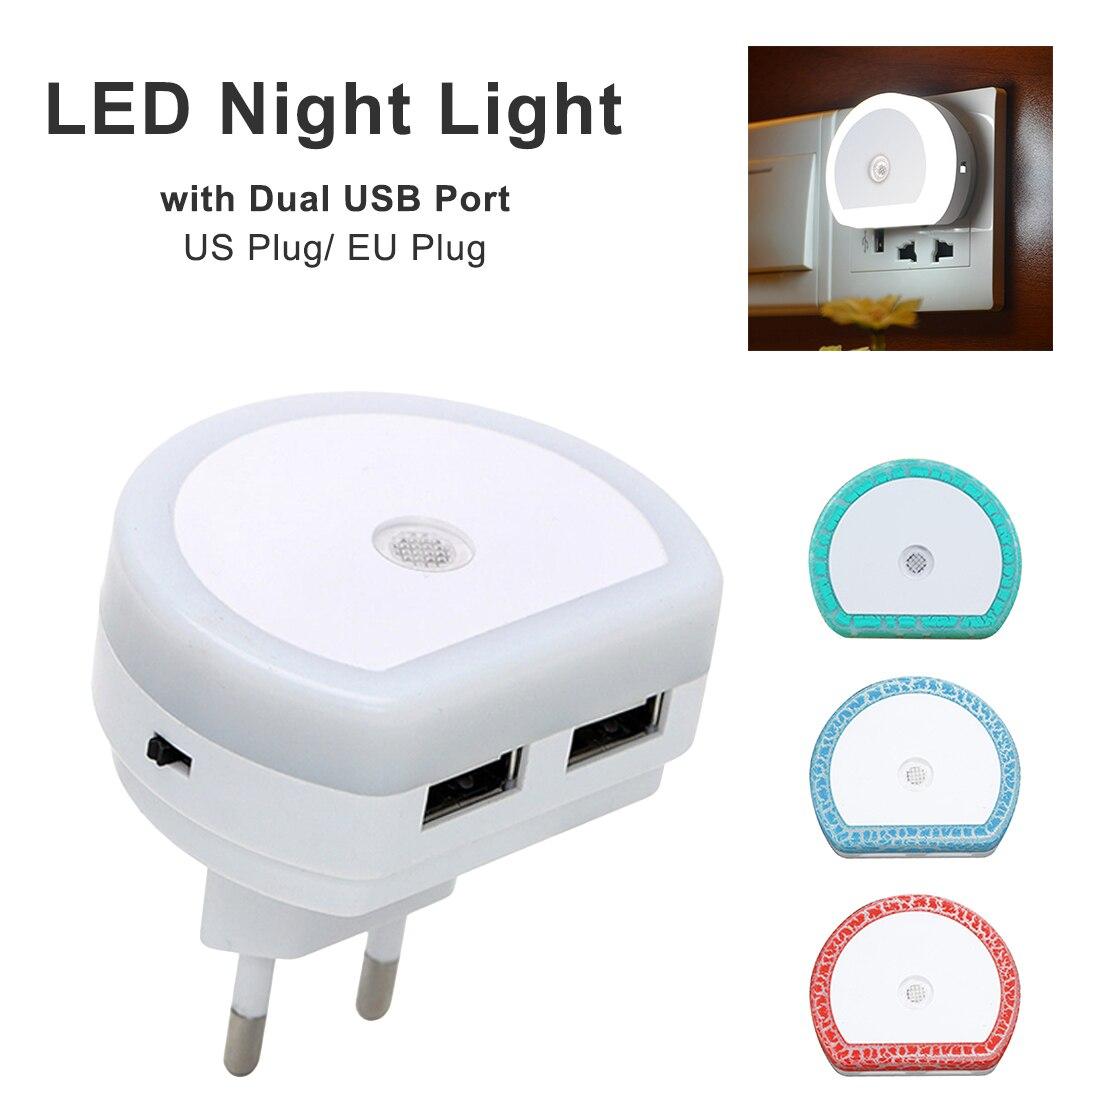 USB LED Night Light Wall Charger Plug Dusk To Dawn Sensor Wall Lamp EU US 5V 1A Socket Lamp